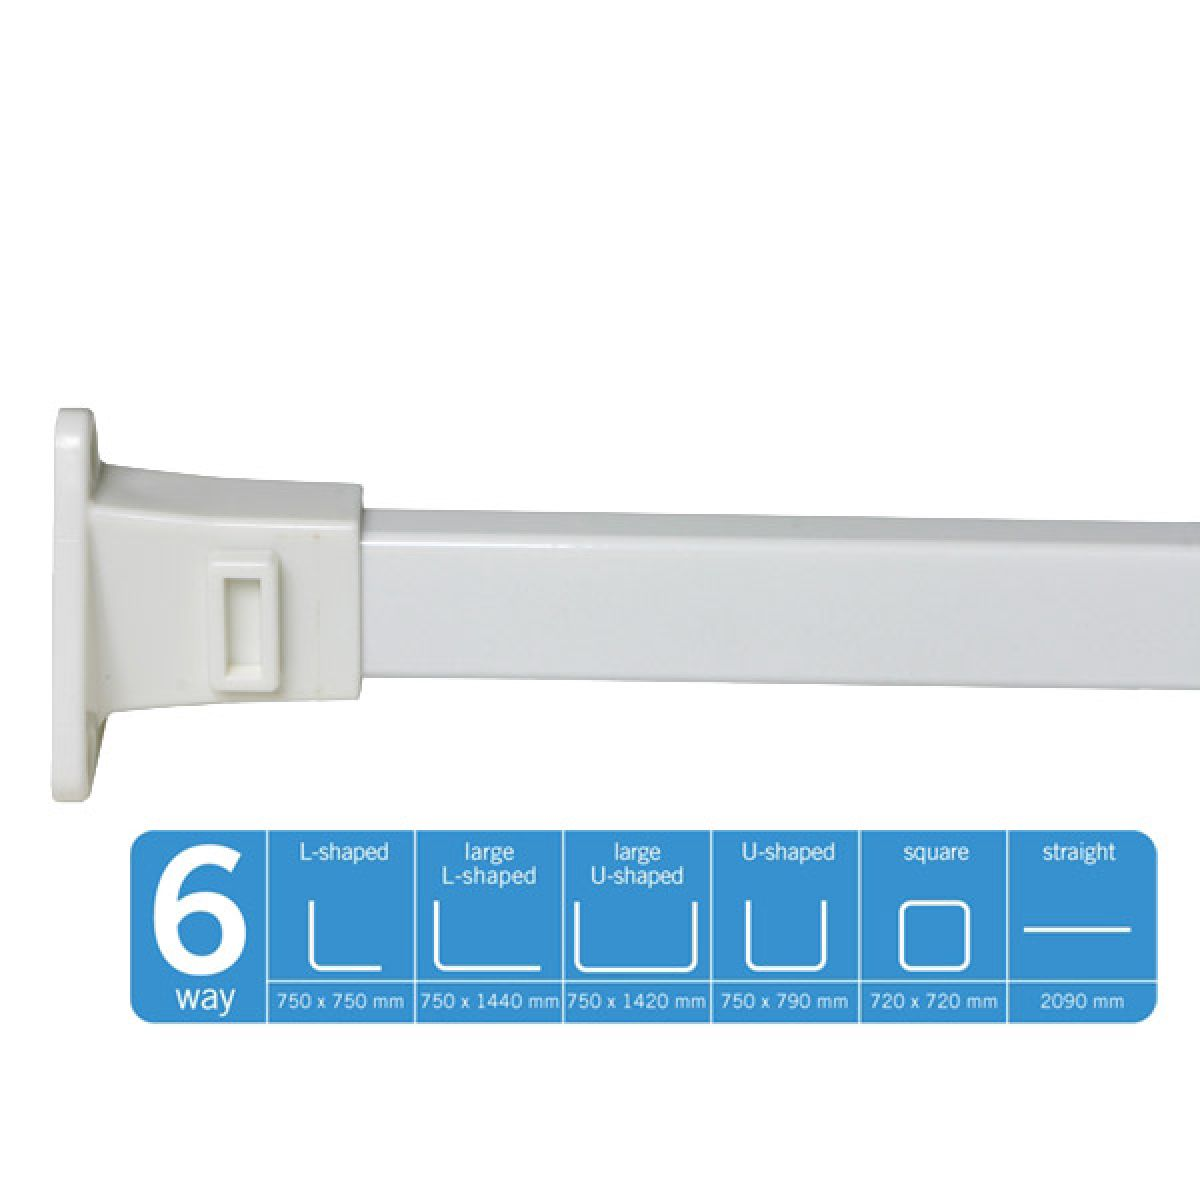 Croydex White Modular Shower Curtain Rail